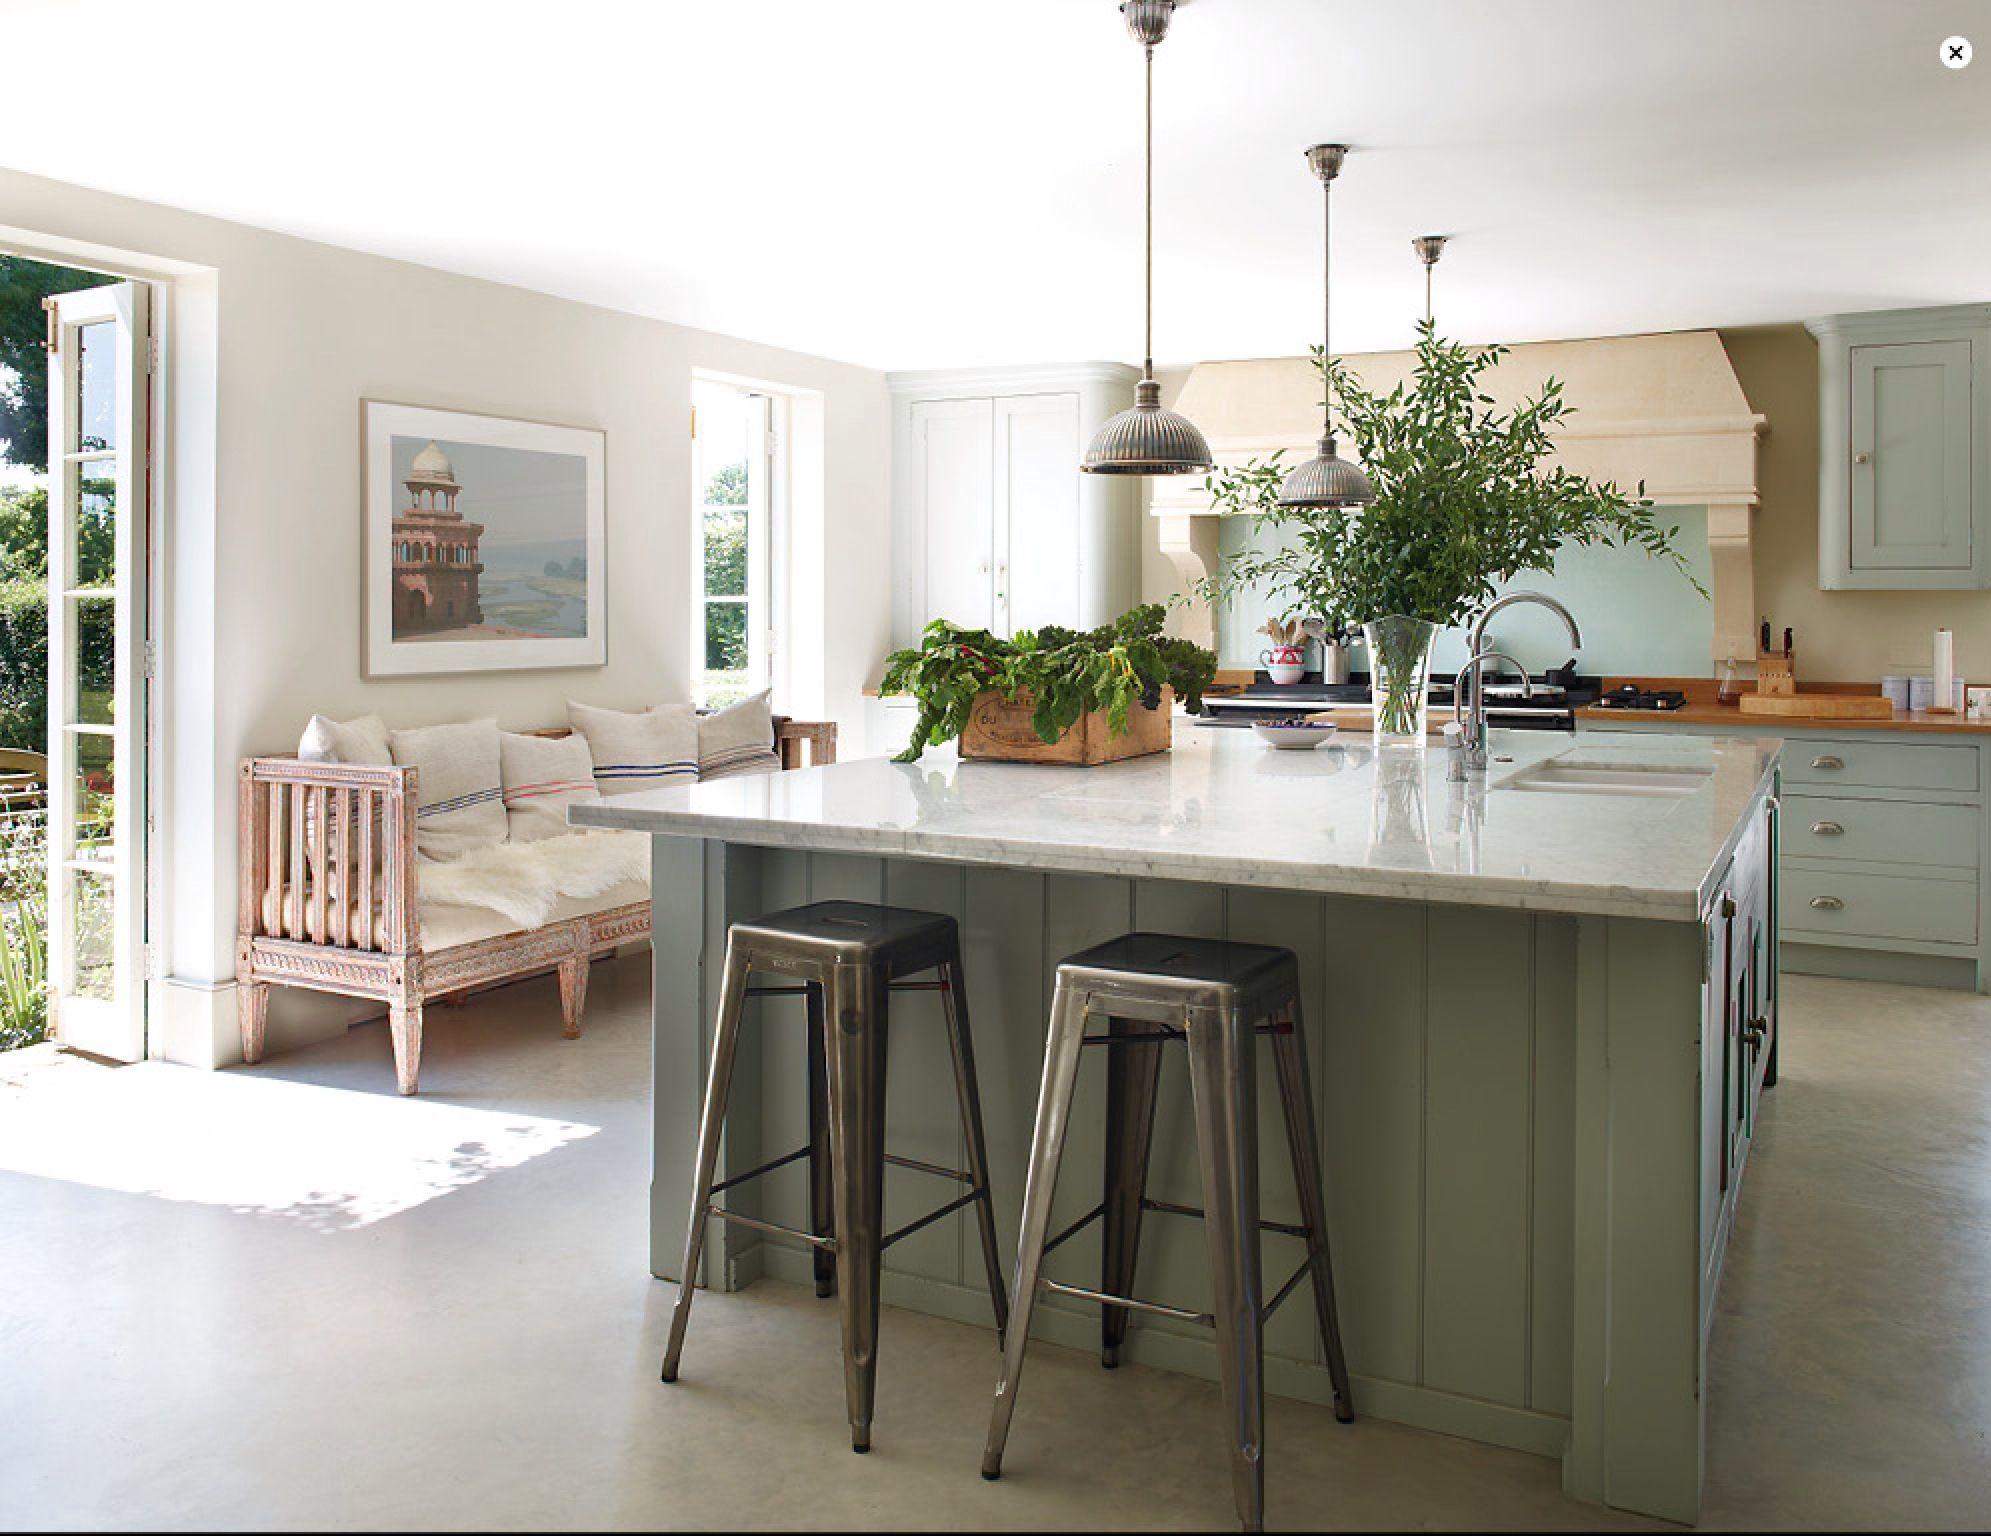 Cool kitchen trends elle decor on new trends in kitchen design - Jemma Kidd S English Country House Kitchen In Elle Decor April 2014 Elledecor Com French Benchkitchen Trendskitchen